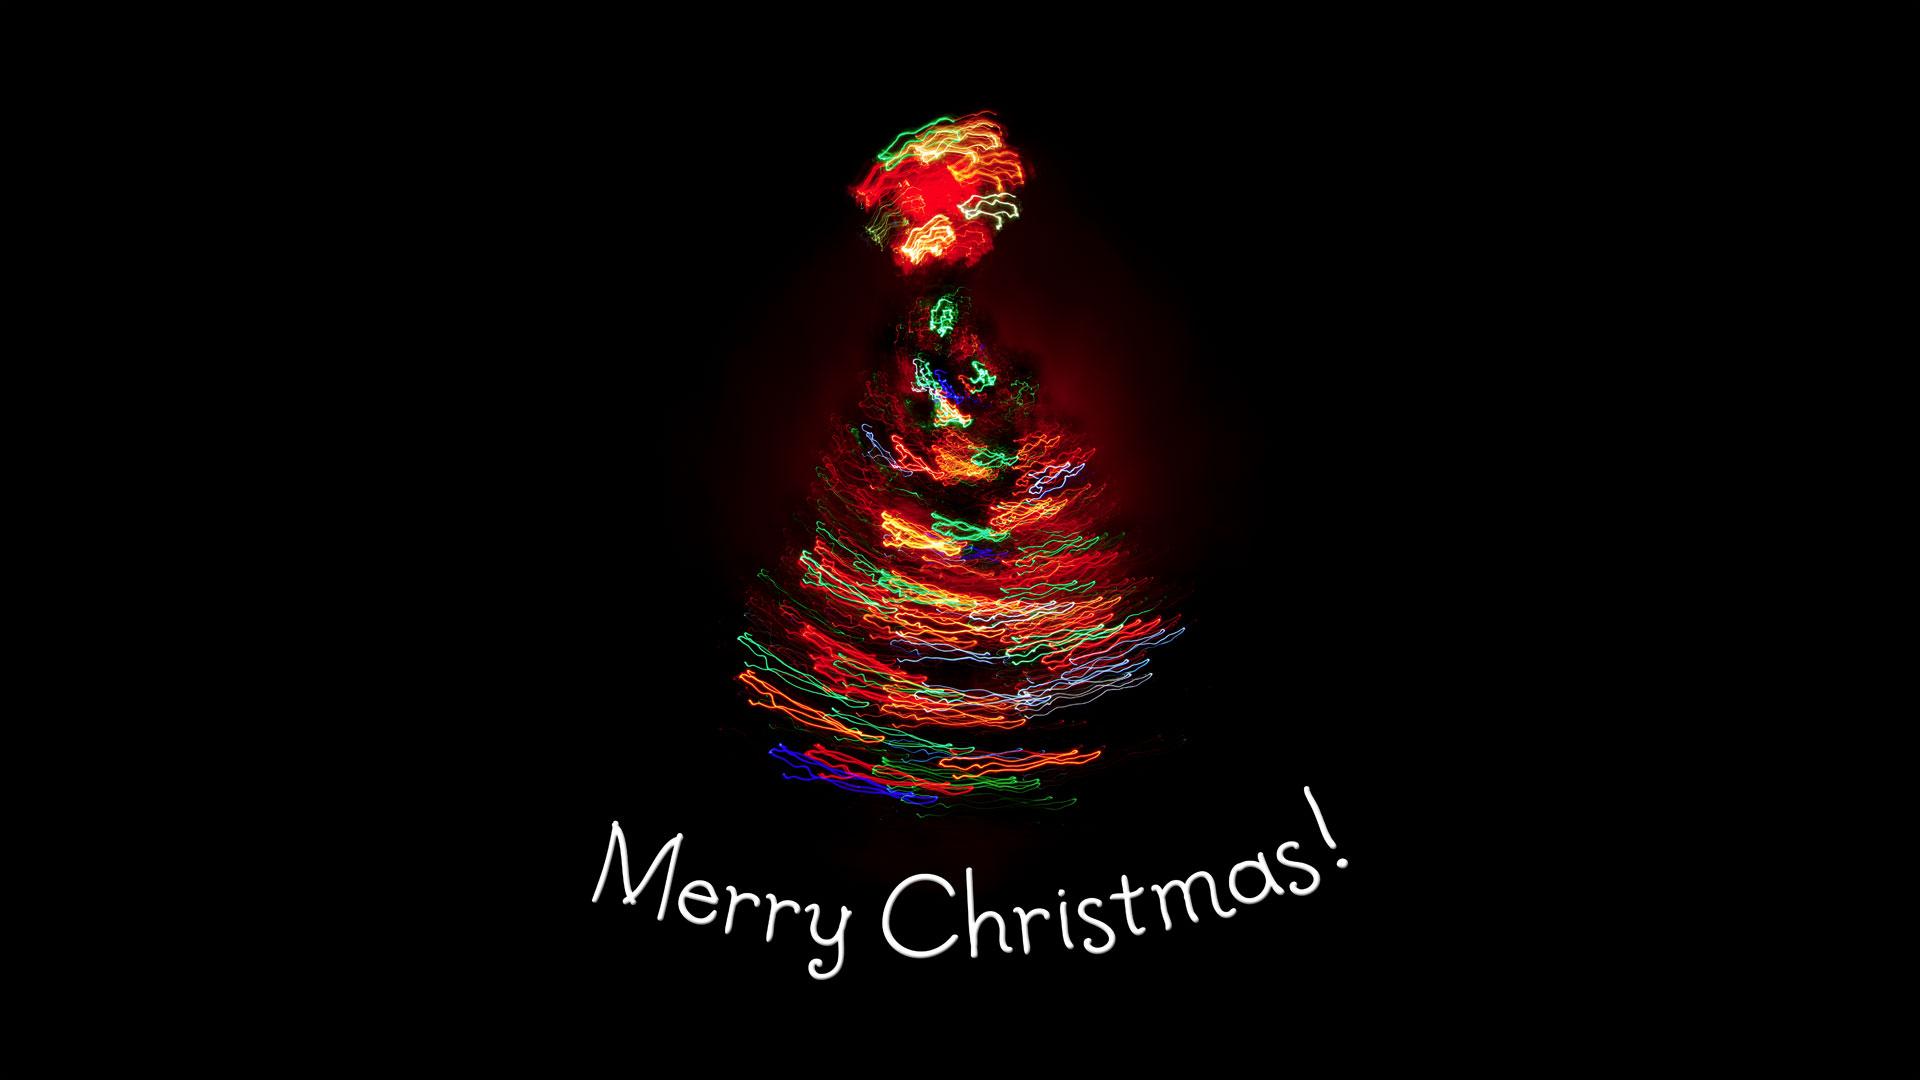 Christmas Tree Light Merry Desktop Themes Background wallpapers HD 1920x1080